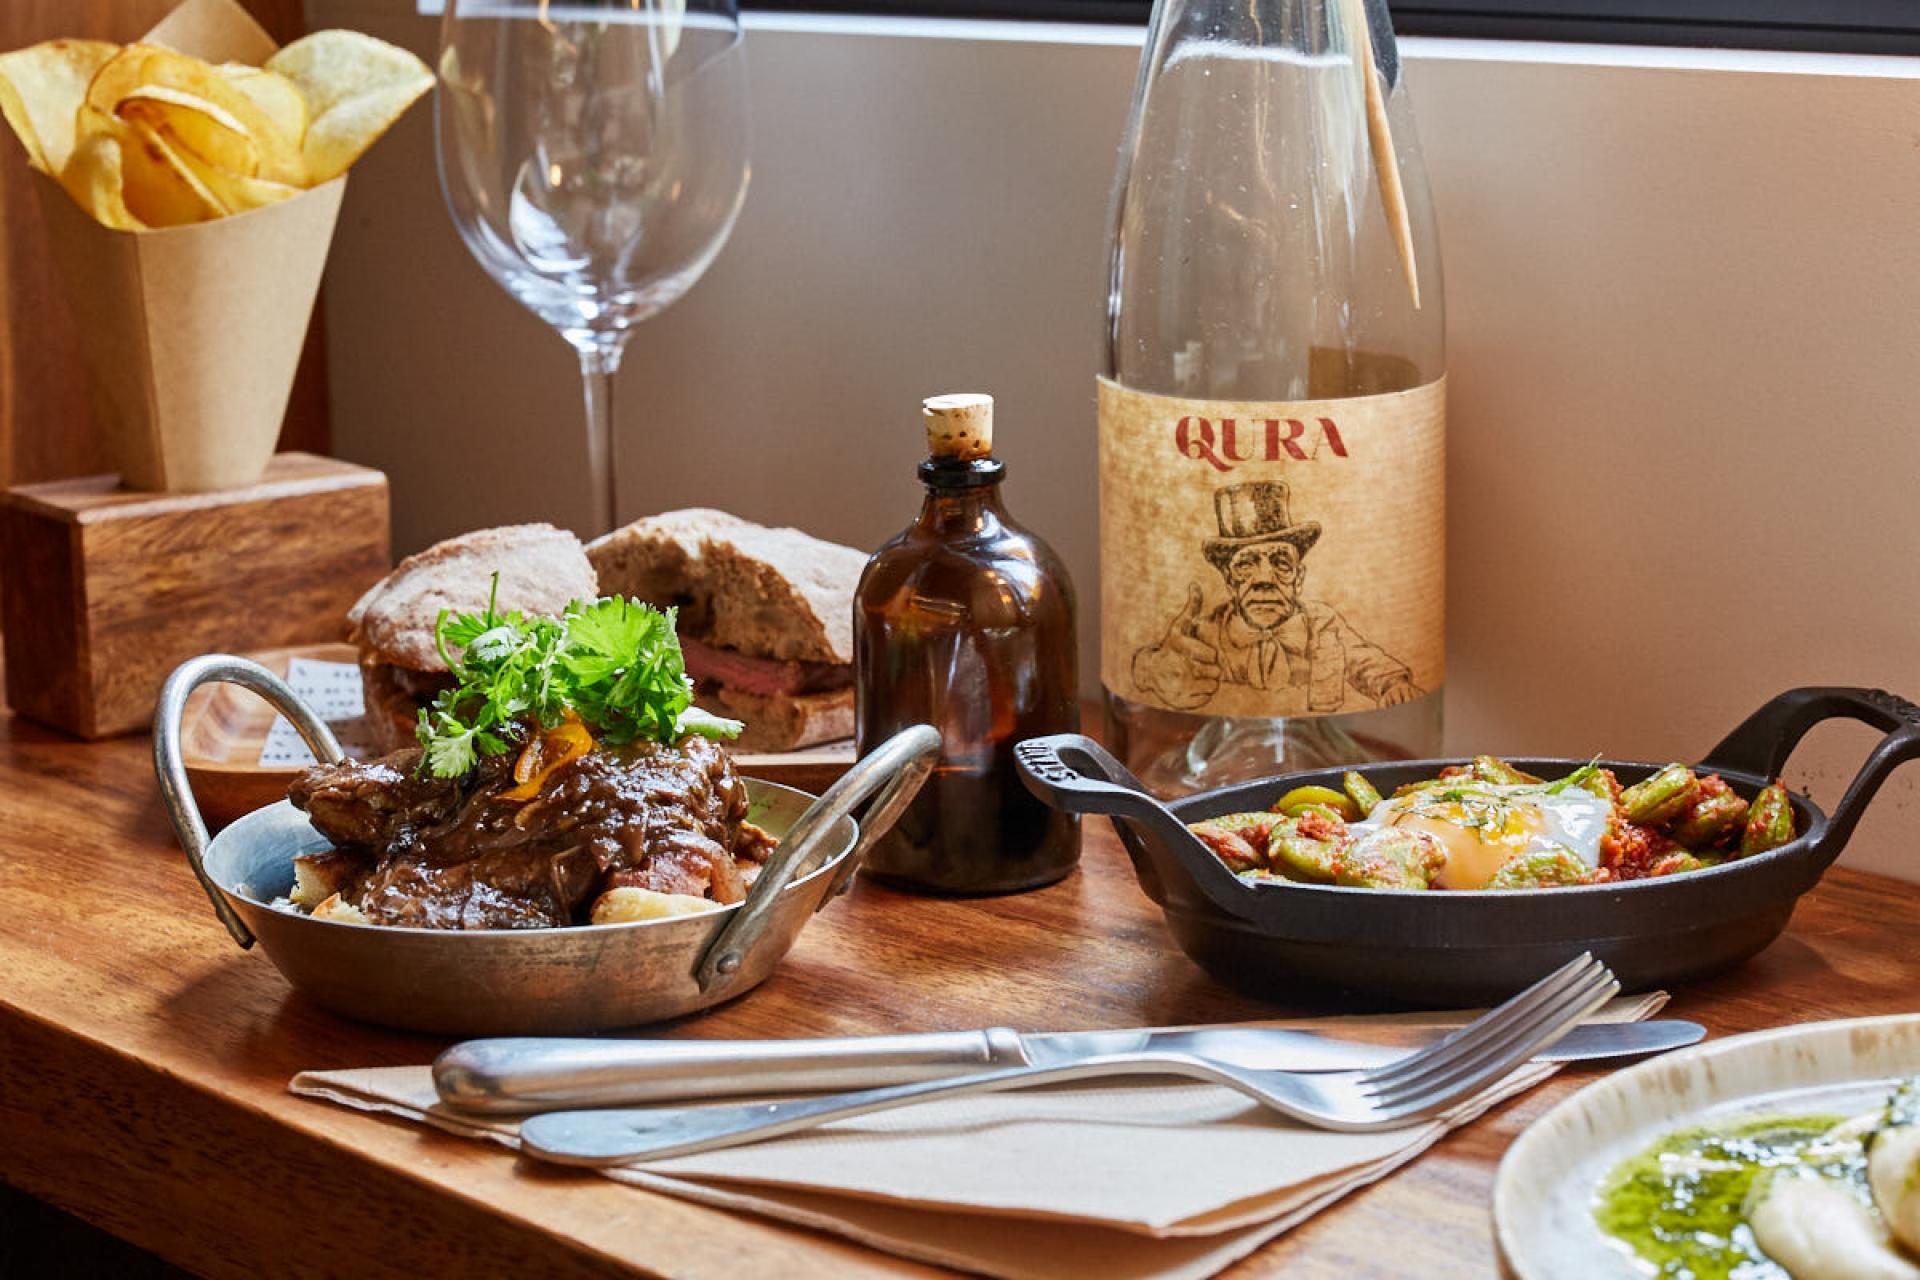 LisboaCool_Comer_Restaurante_Qura